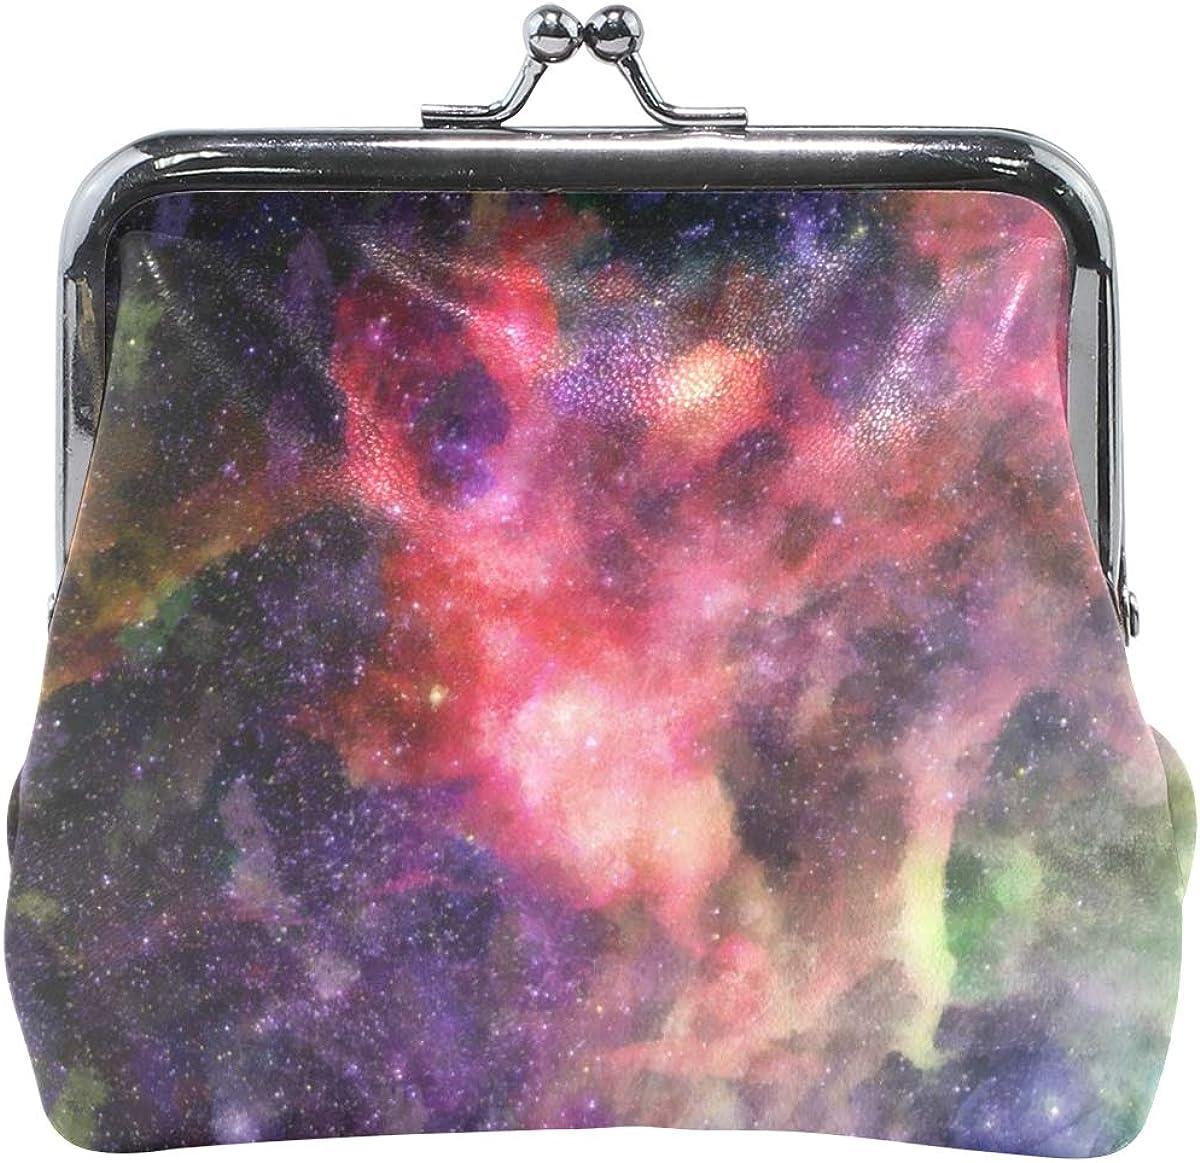 MALPLENA Galaxy Travel Purse Coin case PU leather purse